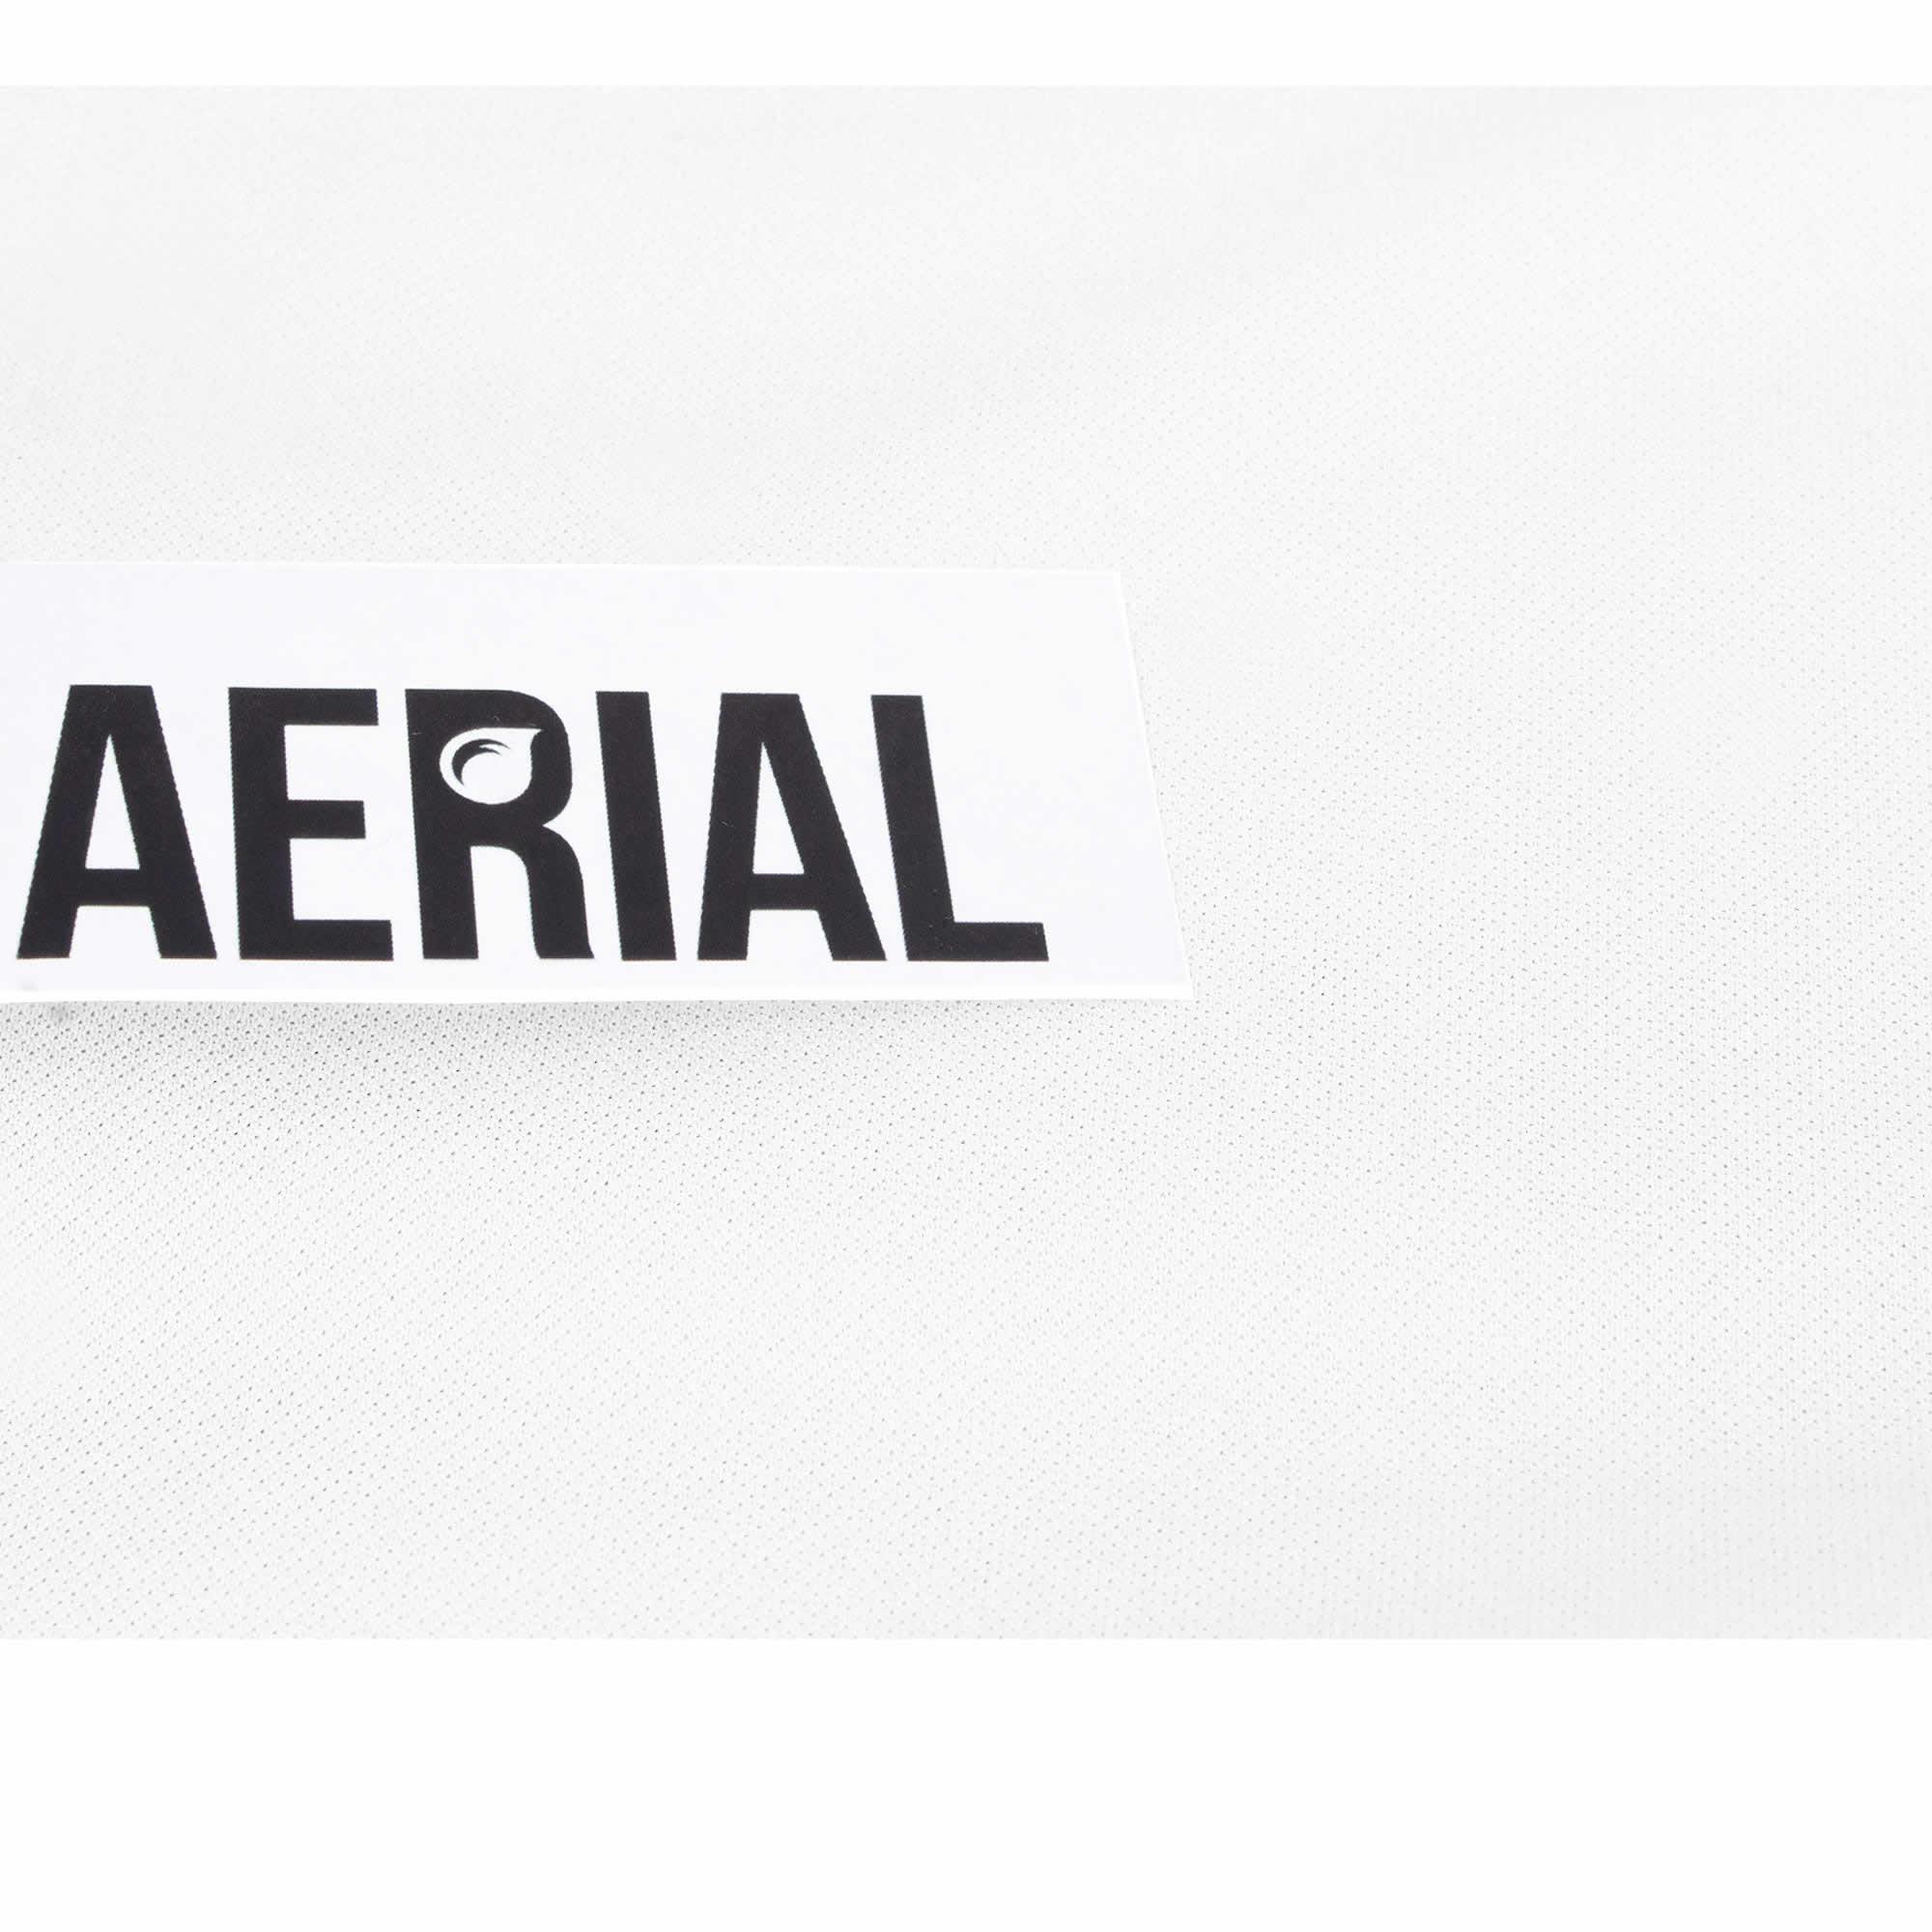 Firetoys Aerial Aerial Firetoys Silk (Aerial Fabric / Tissus) - Weiß-8 metres 5ec7ed